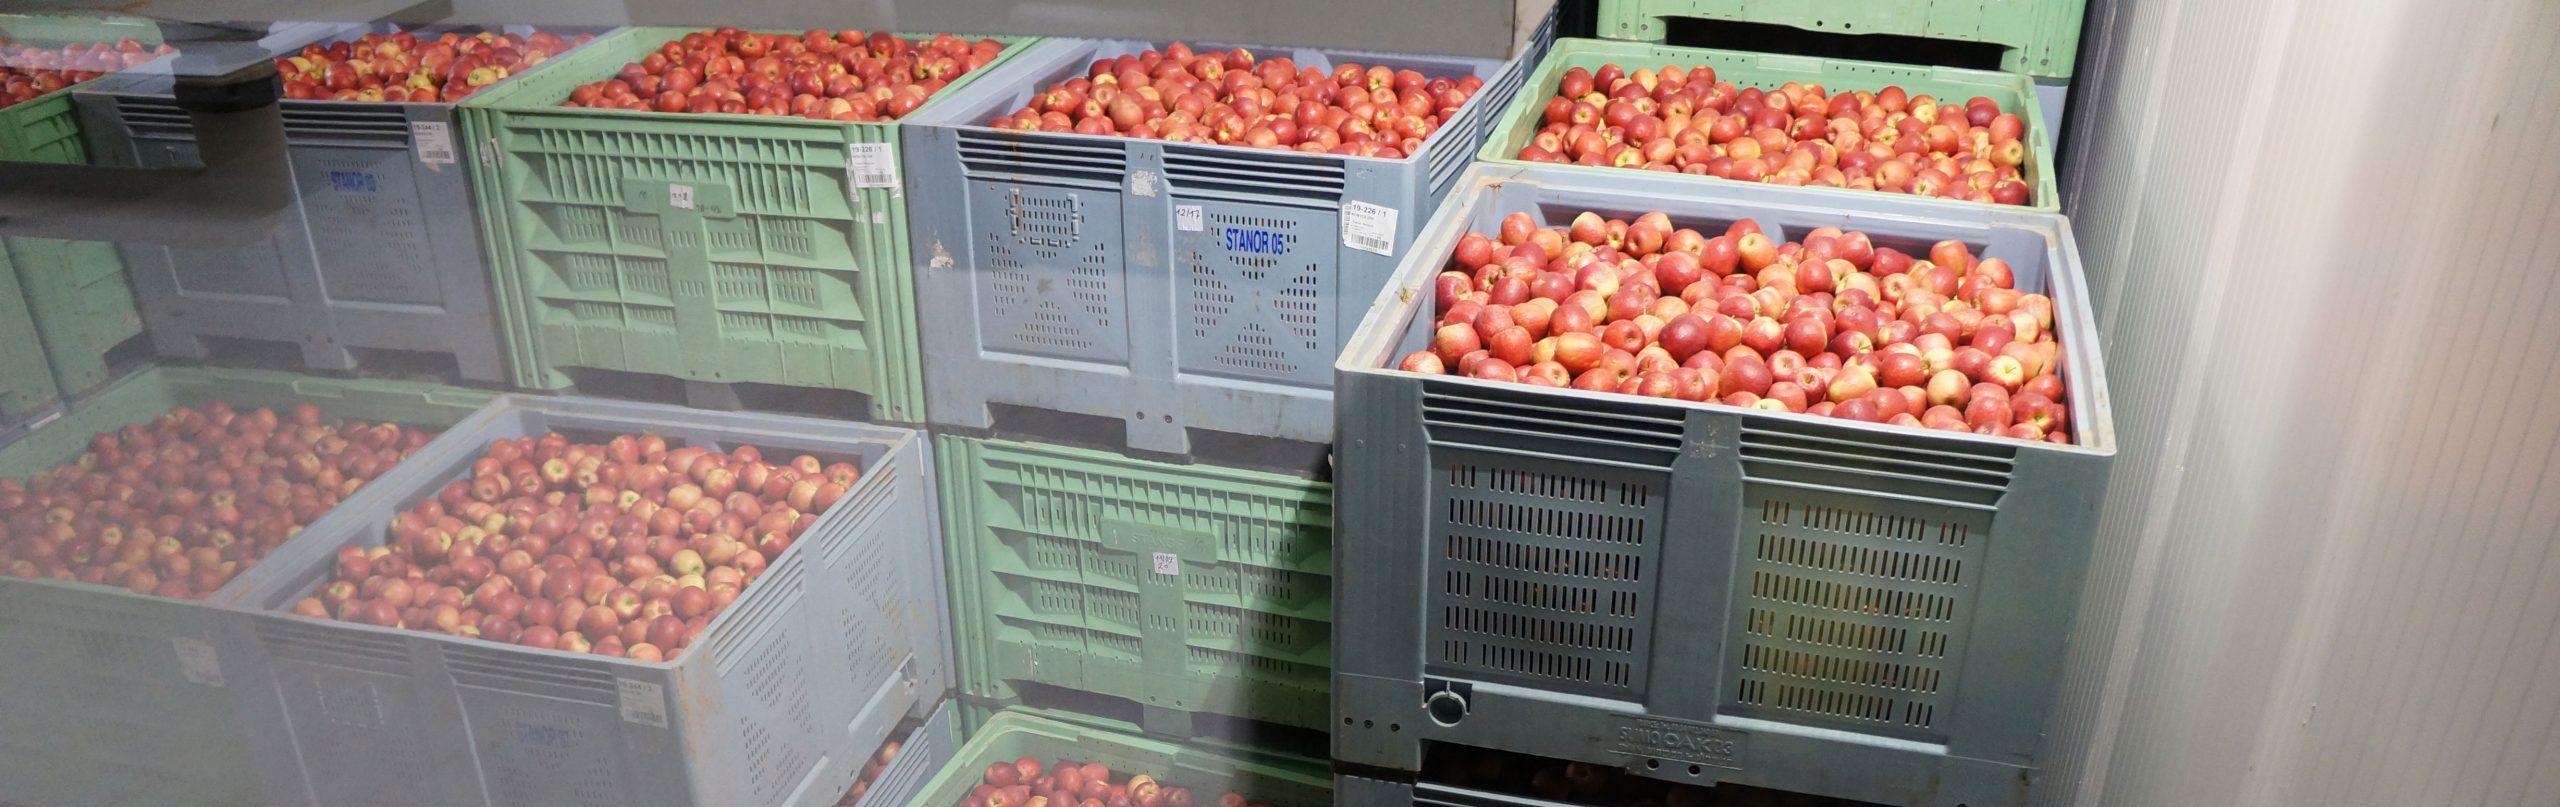 Äpfellagerung